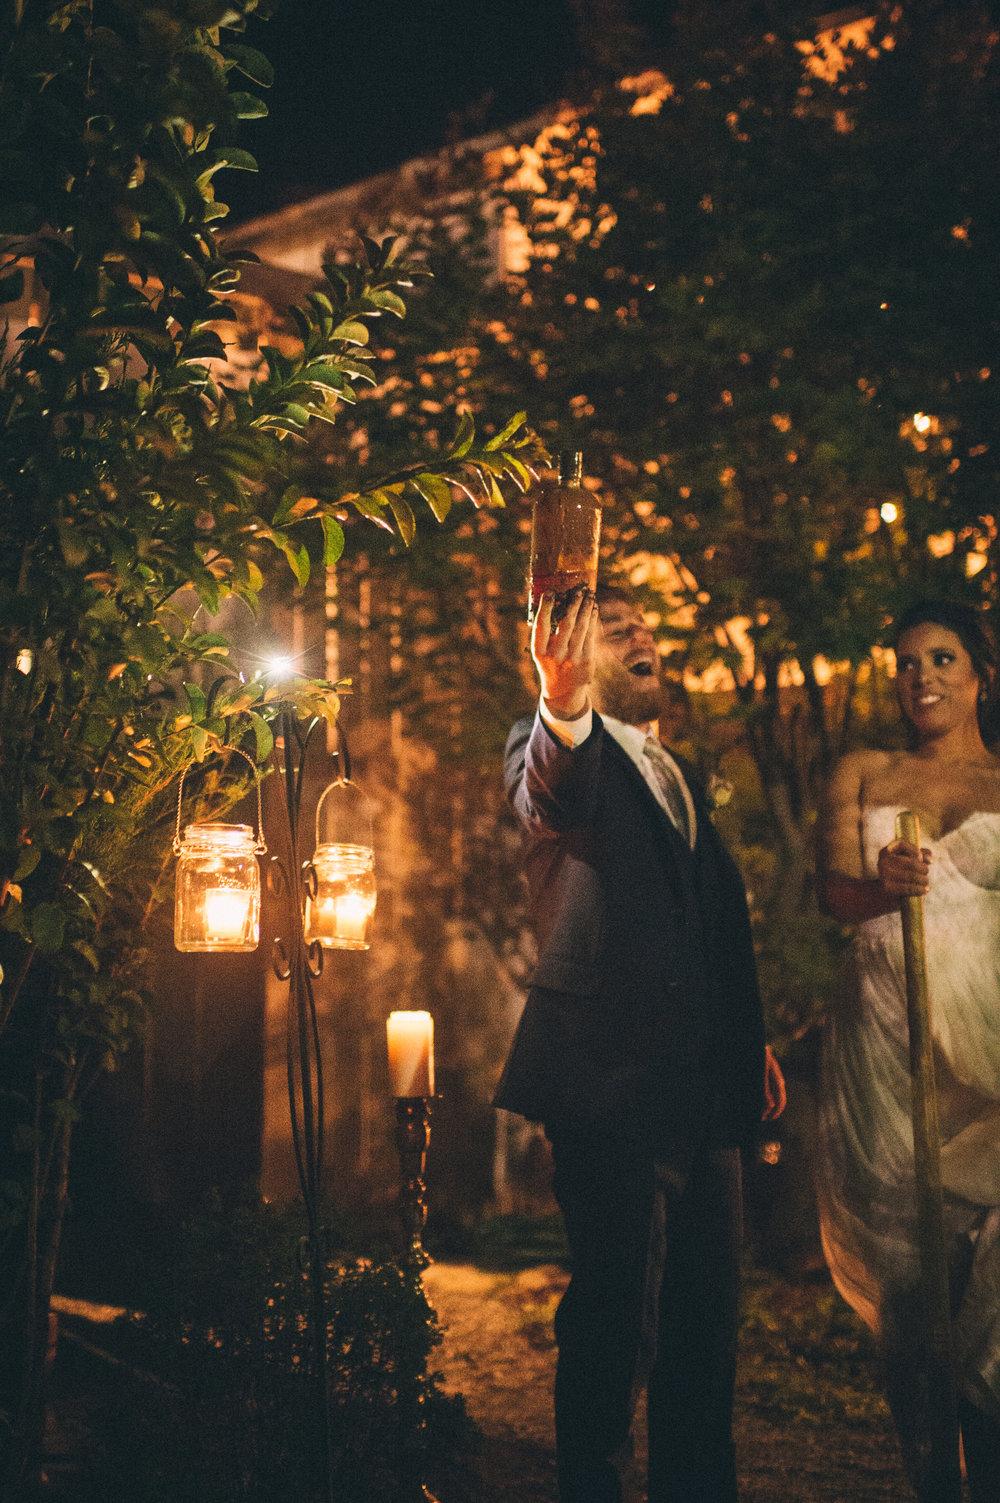 Micaha & Austin // Cozy Autumn Wedding at Springhouse Gardens // Lexington, Kentucky // Wedding Photography // Reception // Bury Bourbon